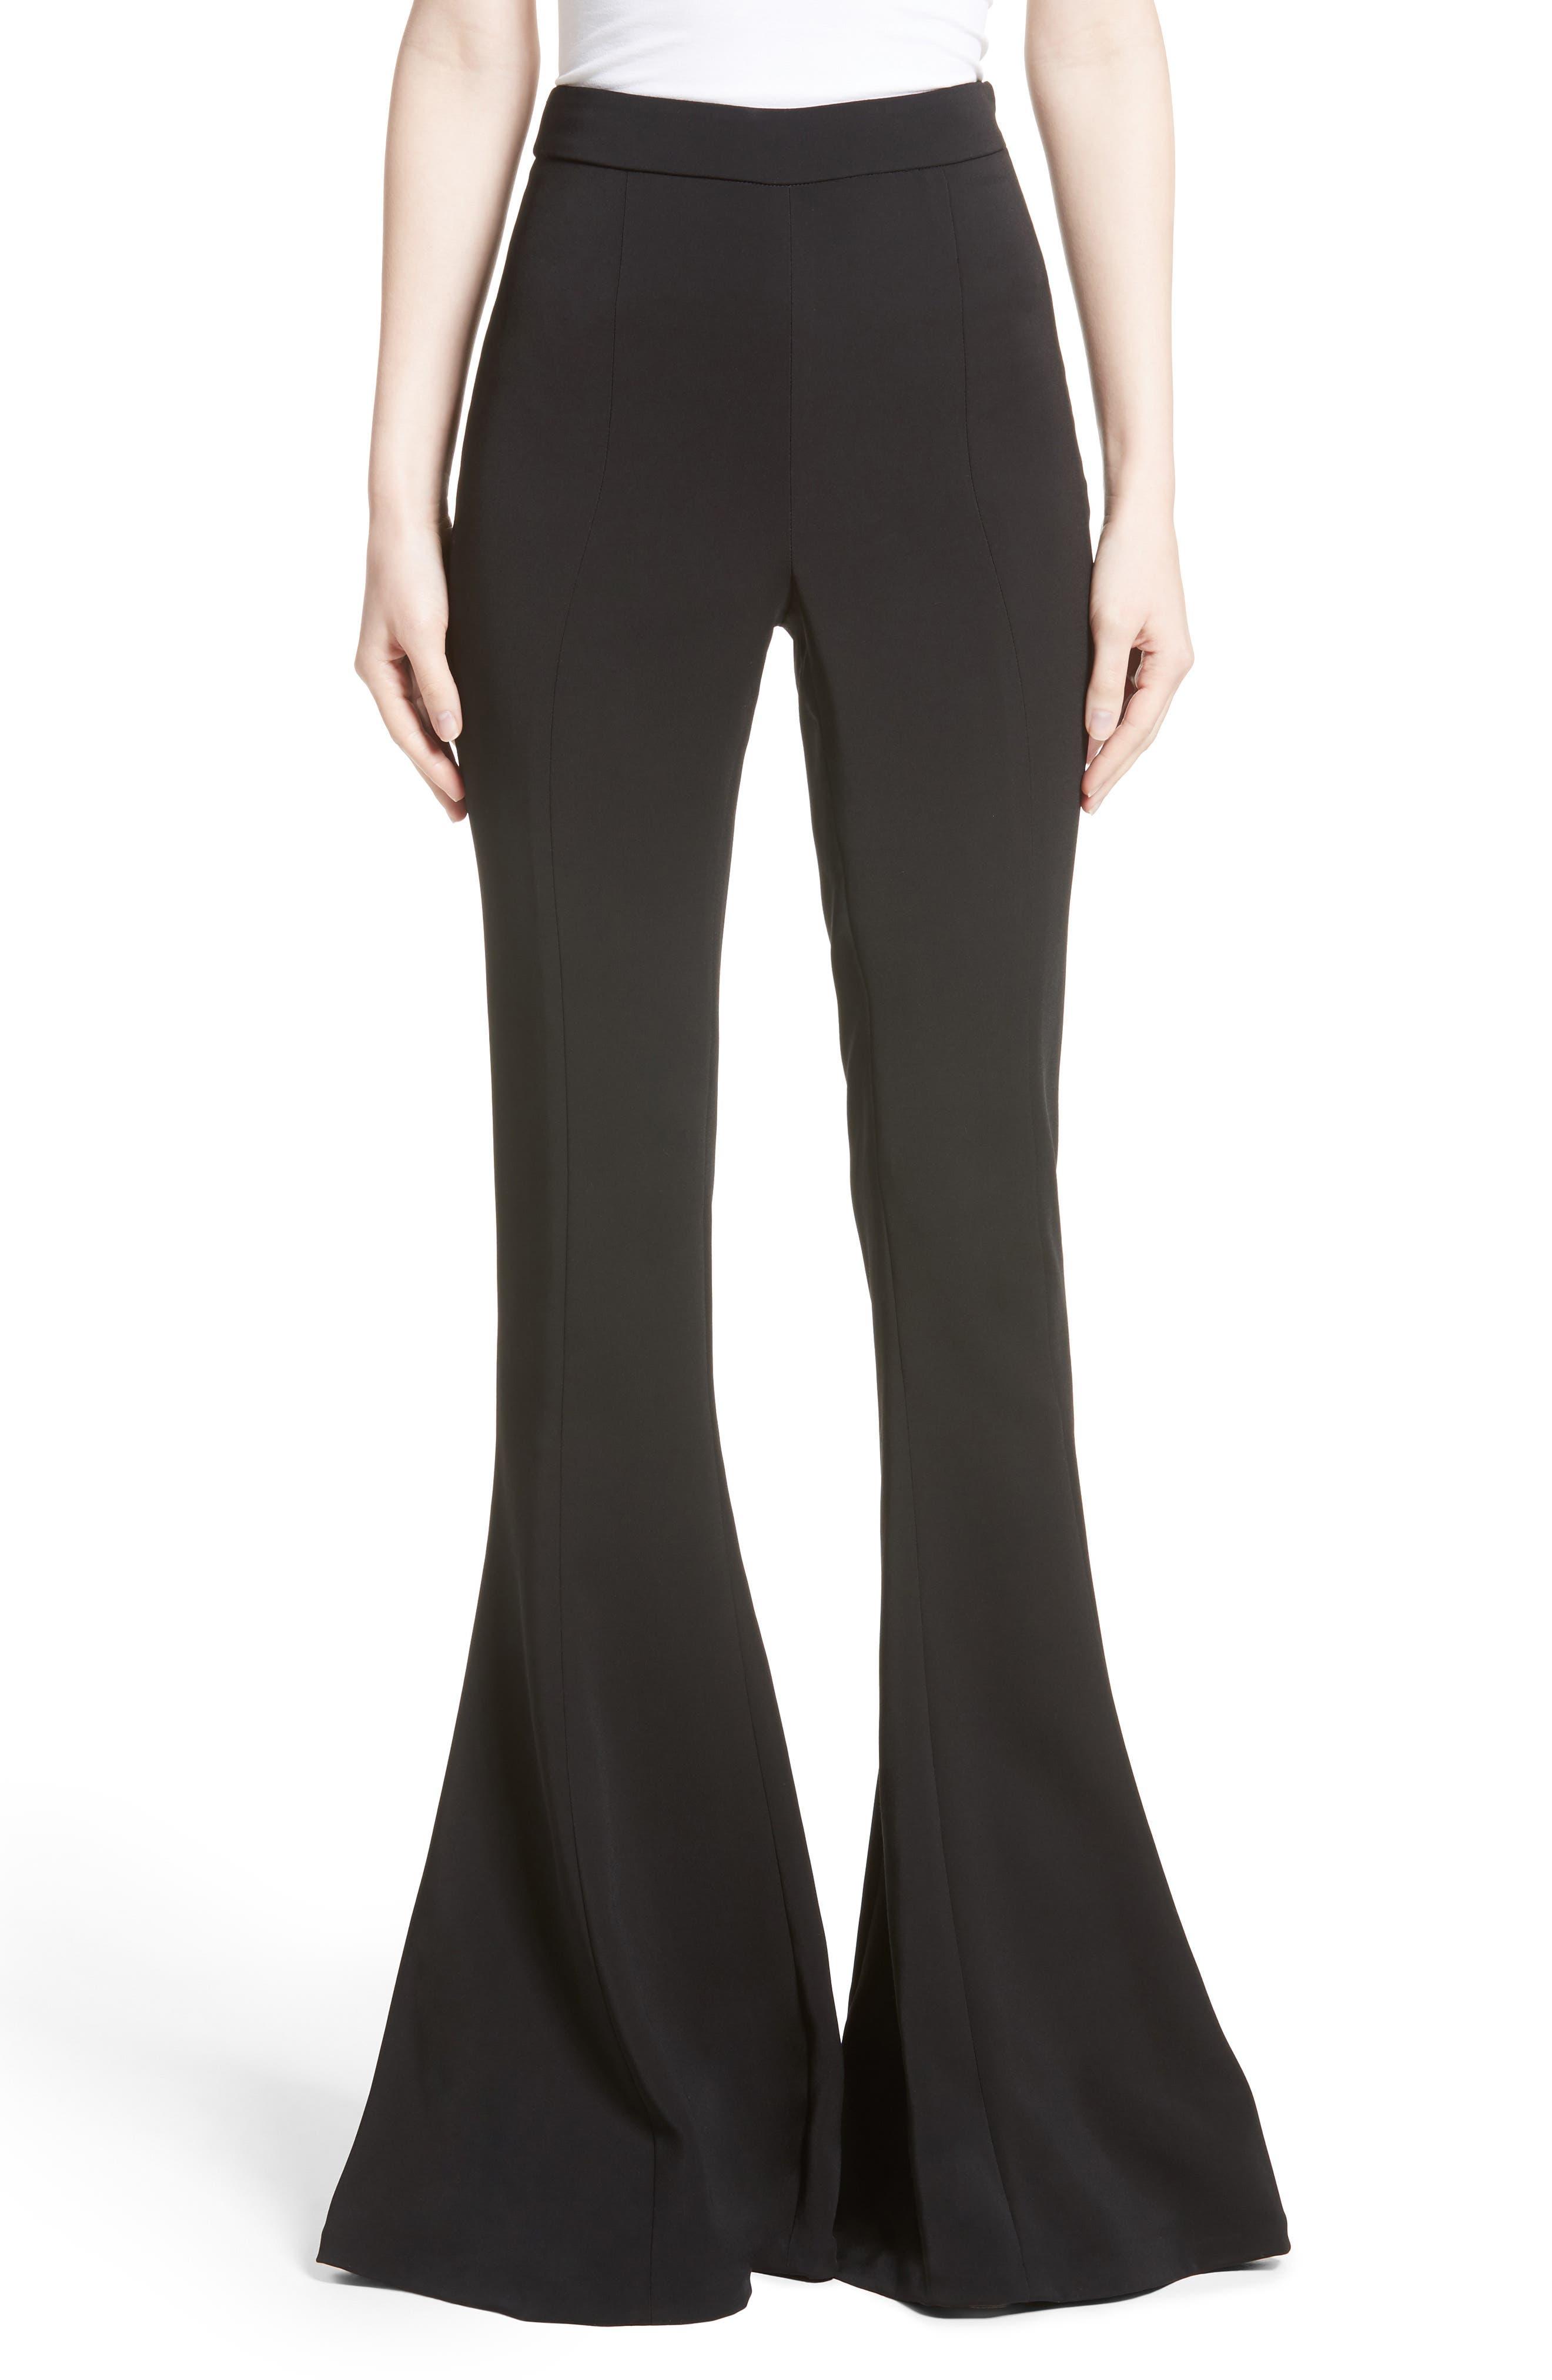 Naomi High Waist Flare Pants,                         Main,                         color, 001